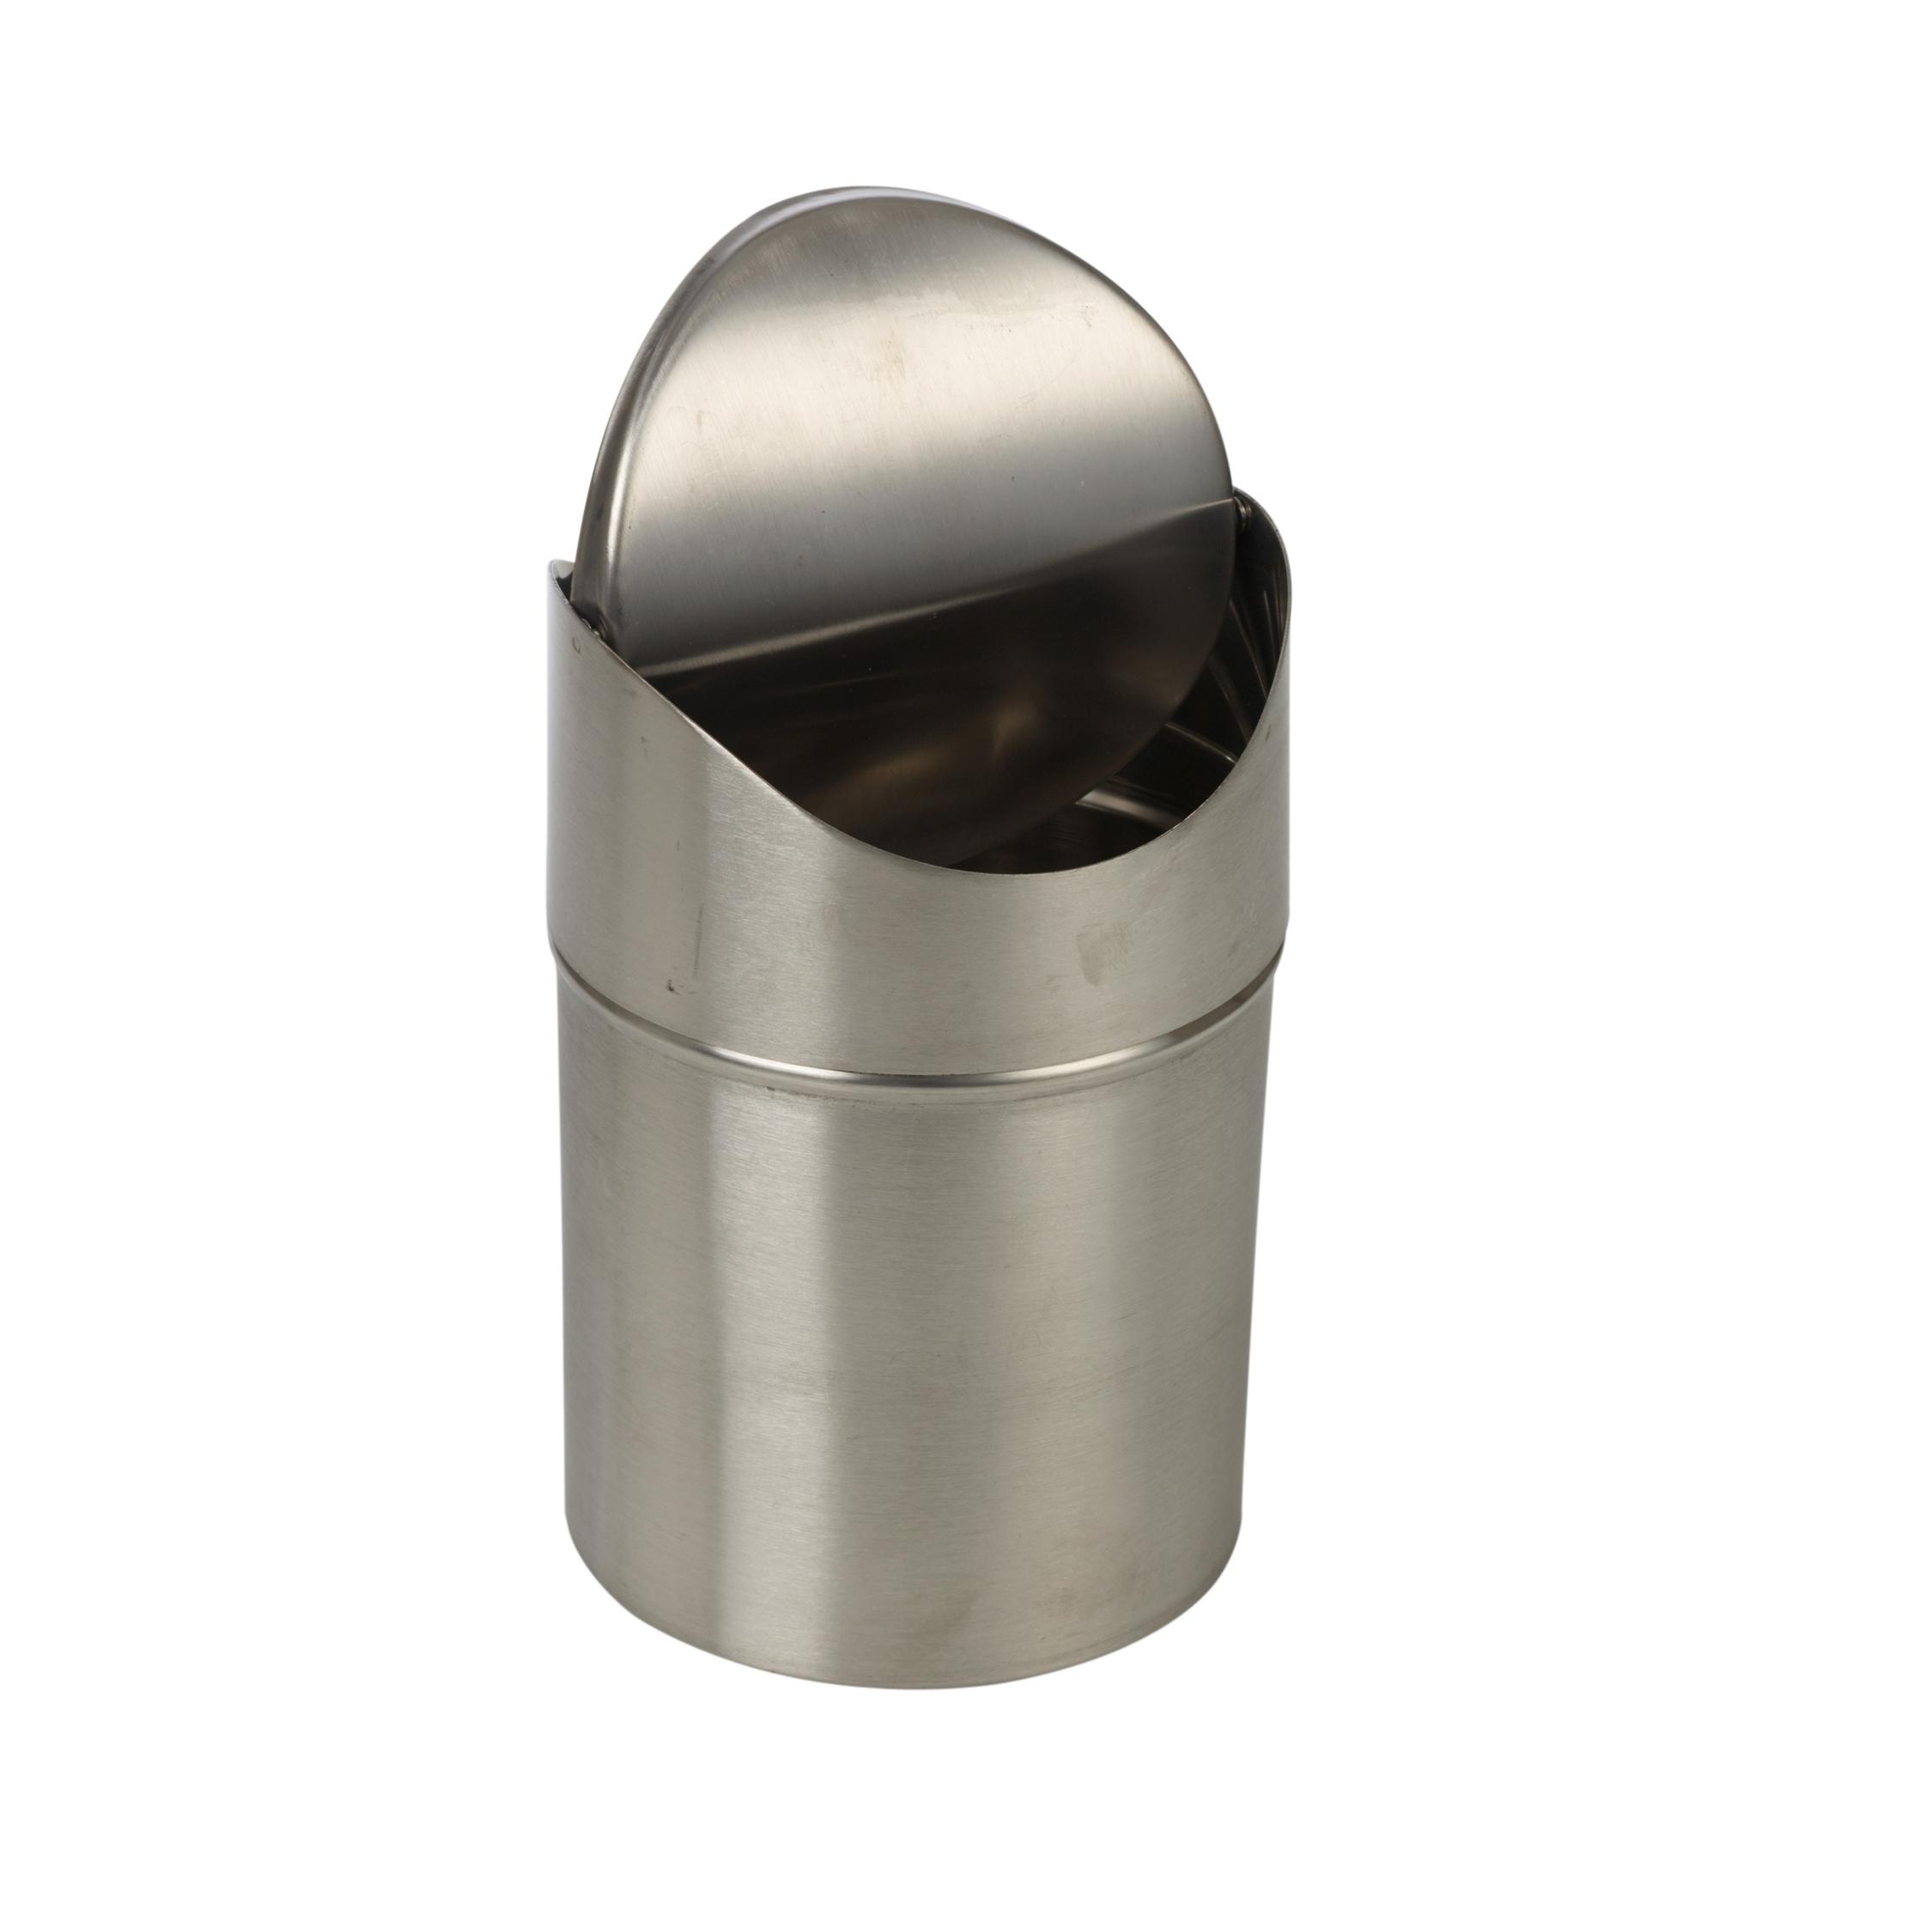 stainless steel 1 5l l klein abfalltonne schwingdeckel k chenarbeitsplatte ebay. Black Bedroom Furniture Sets. Home Design Ideas